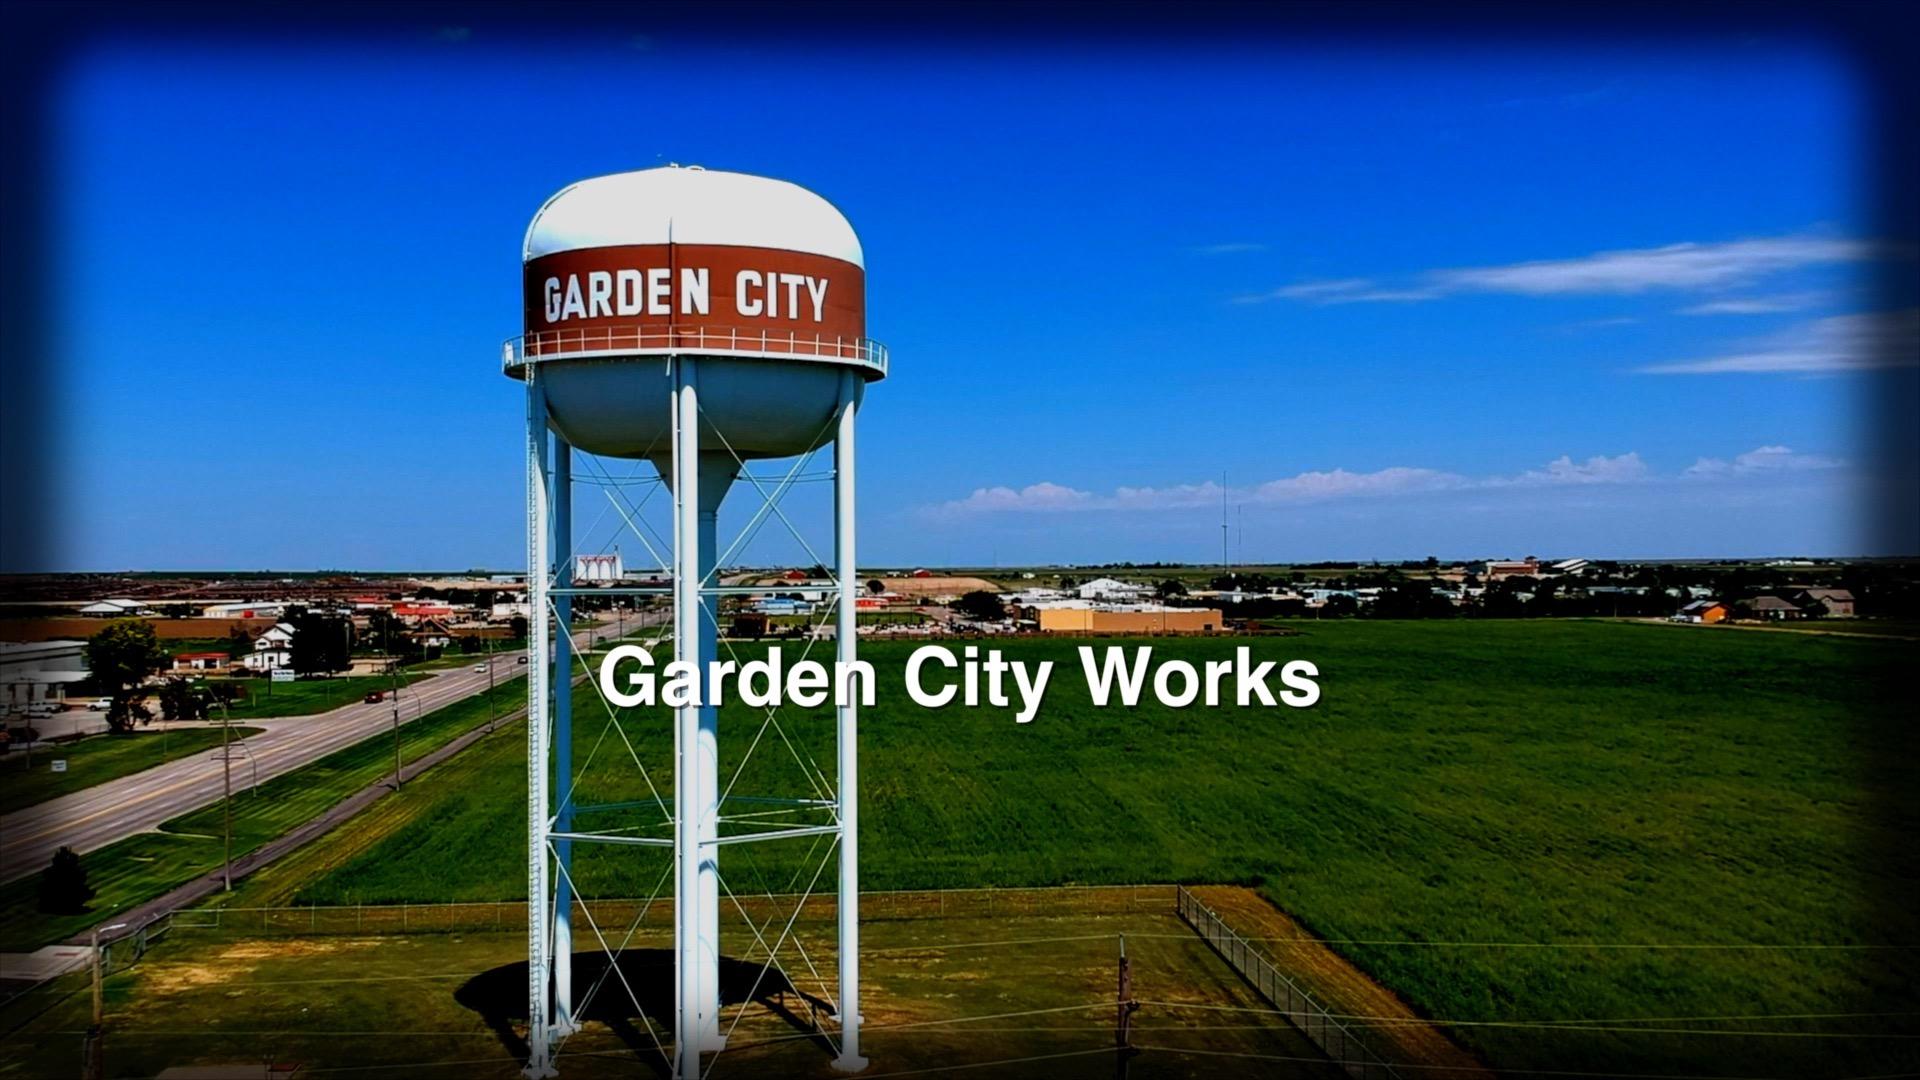 Garden City Works - Film Premiere Event Image